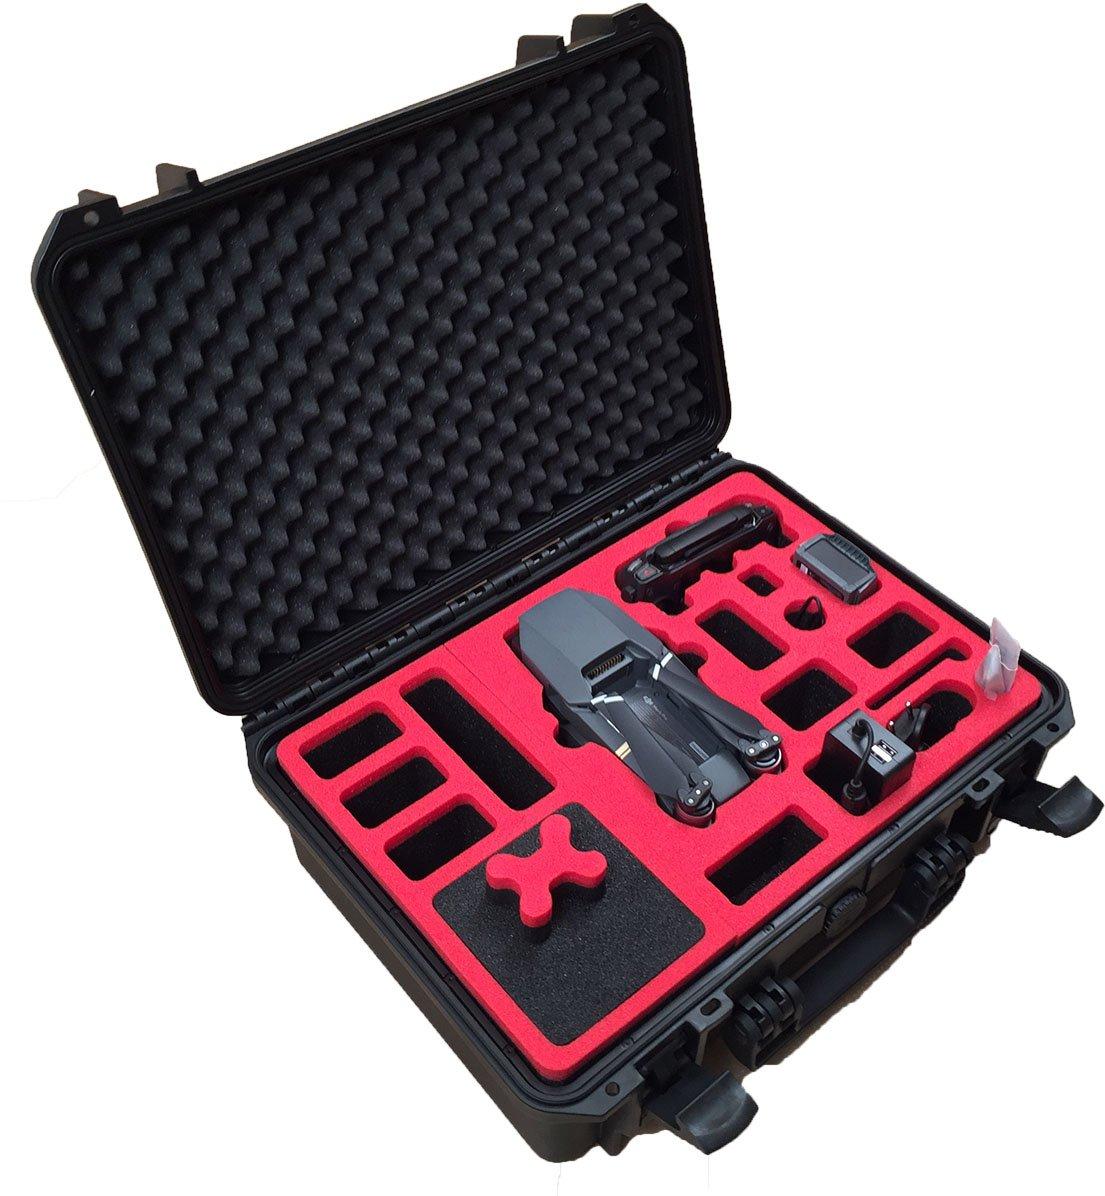 faf898c040c6 Professional Carrying Case fits for DJI Mavic Pro - Explorer Case ...